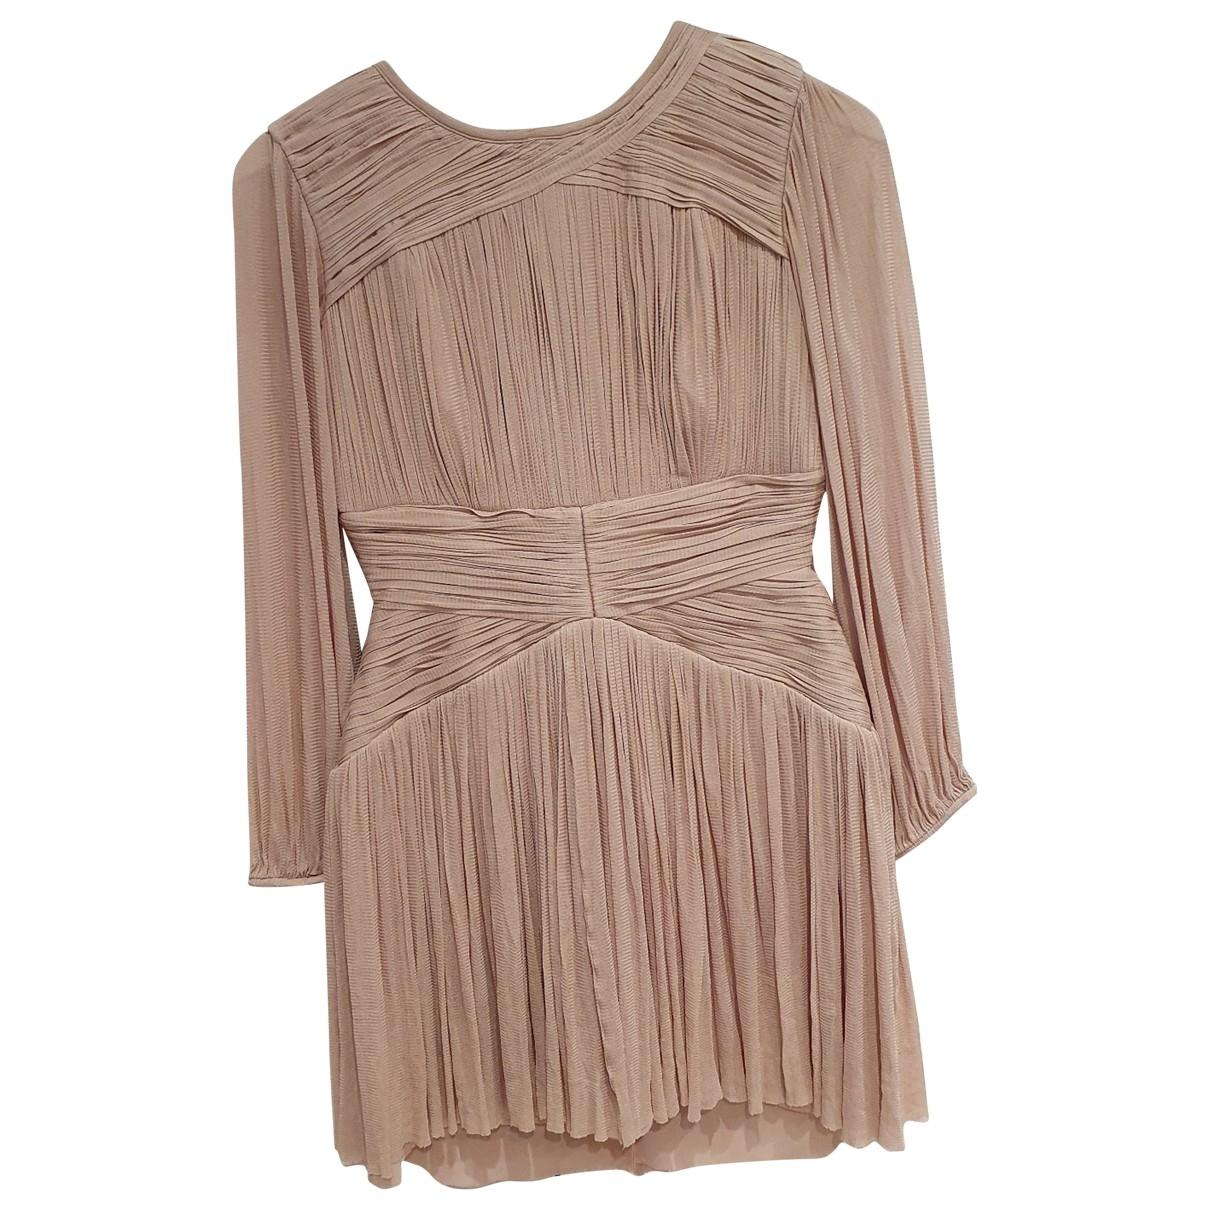 Maria Lucia Hohan \N dress for Women 36 FR